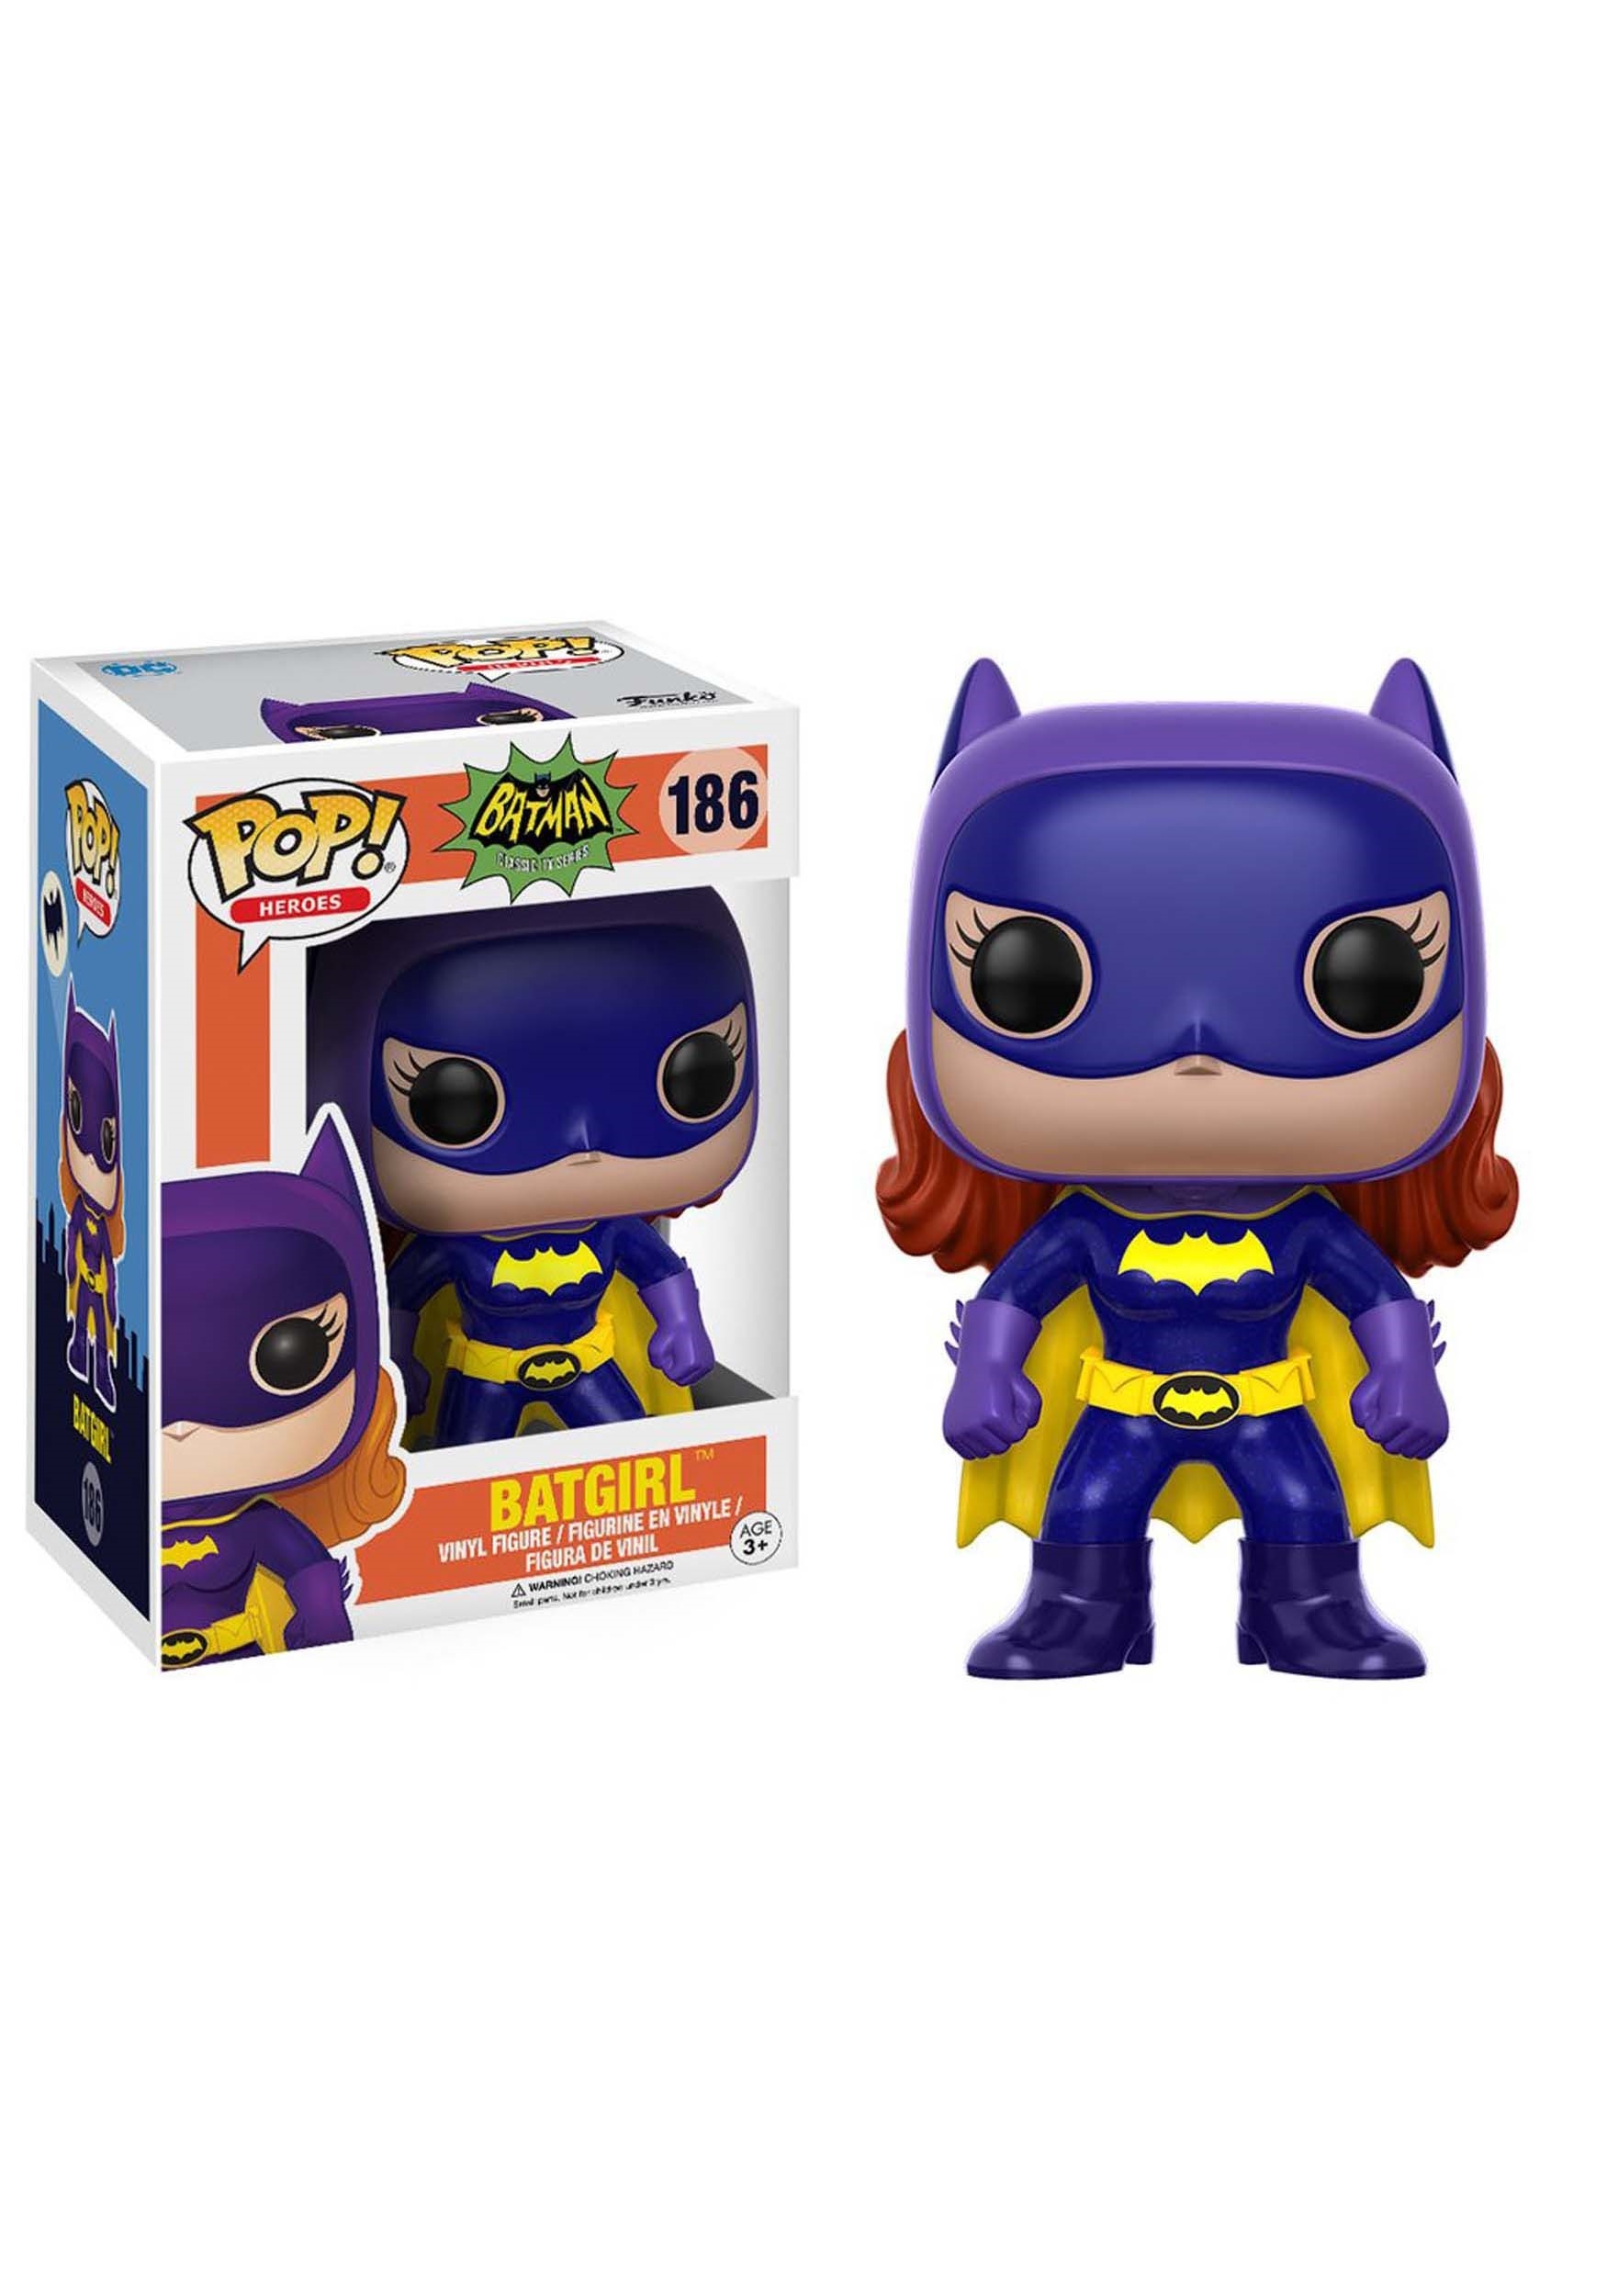 DC Heros Batgirl POP! Vinyl Figure FN13632